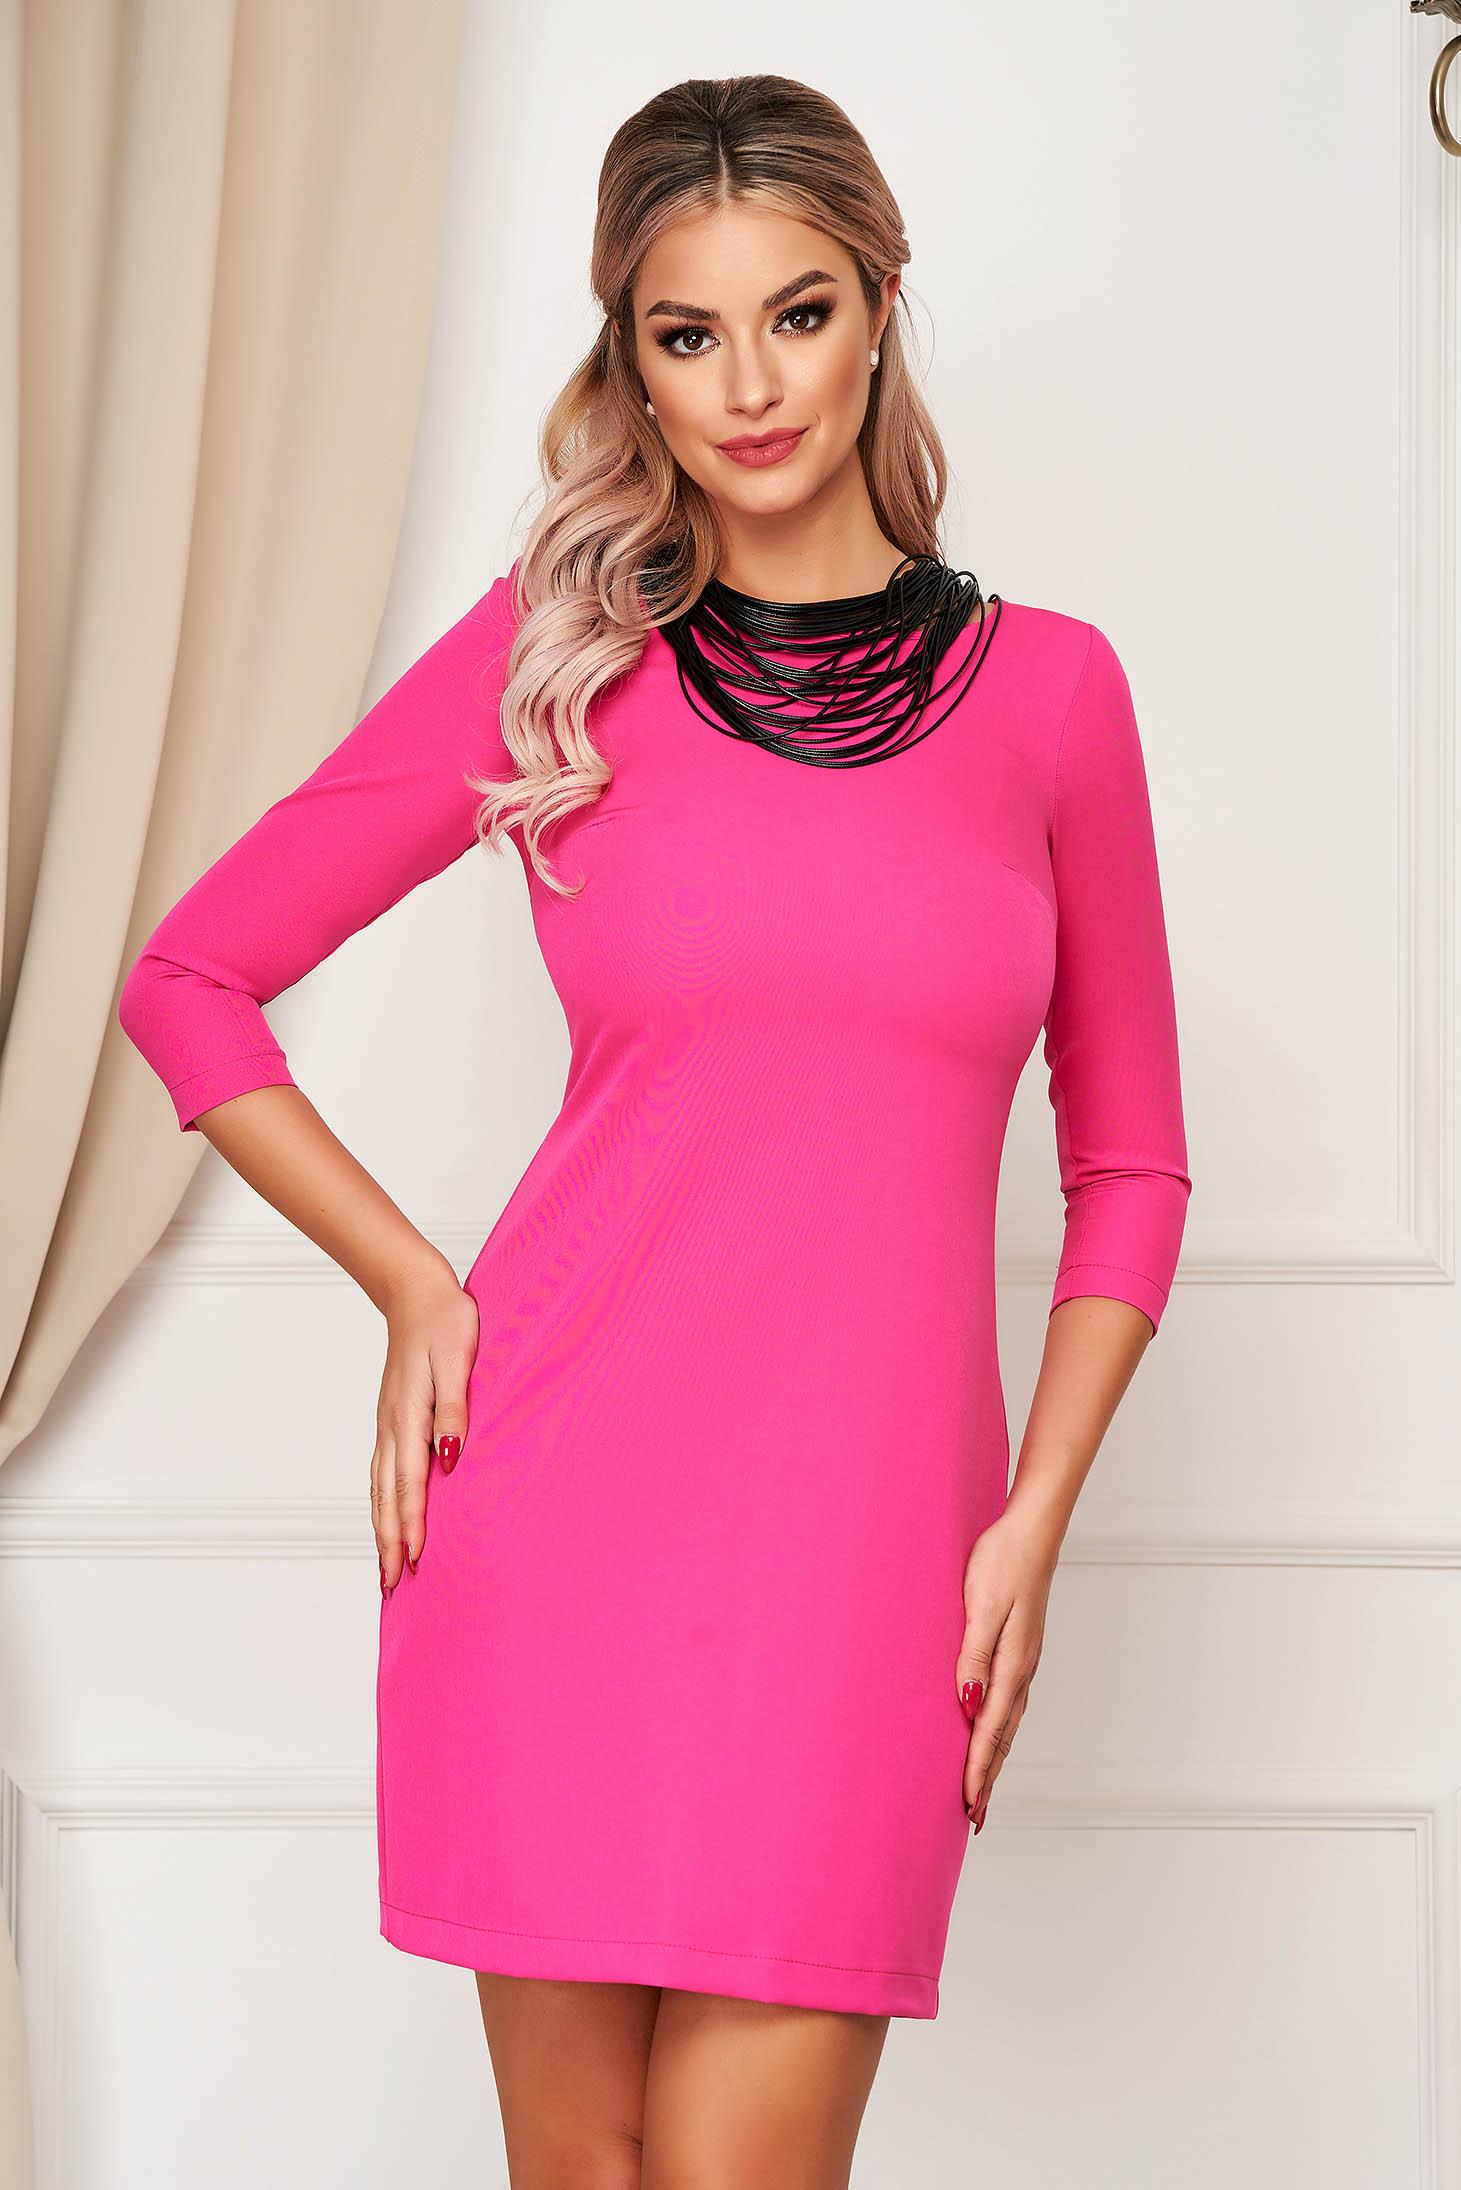 Rochie StarShinerS roz eleganta scurta cu un croi drept din stofa usor elastica